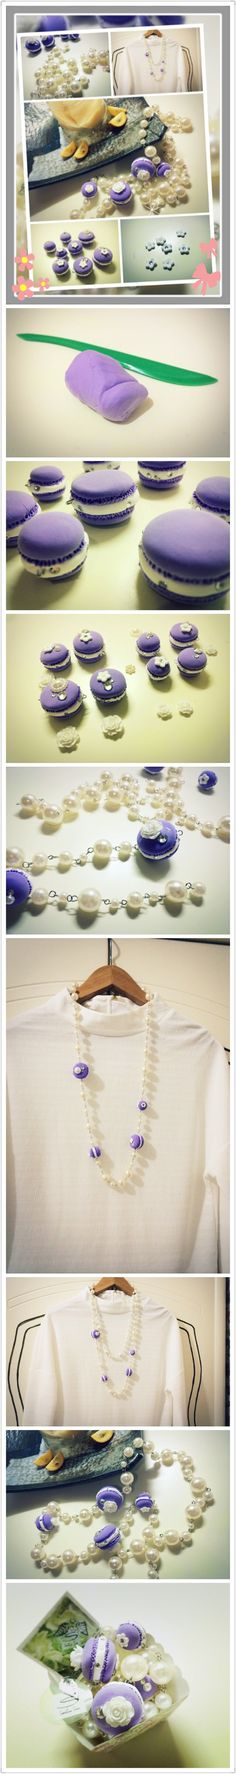 芋頭macaroon!! Enjoy ^^ Fanpage: @Sallee Ebbett Tutor 莎莉。品味儷人 分享link: http://siusally.blogspot.hk/2014/04/salleeejewelry-taro-macaroon-charity.html?m=1